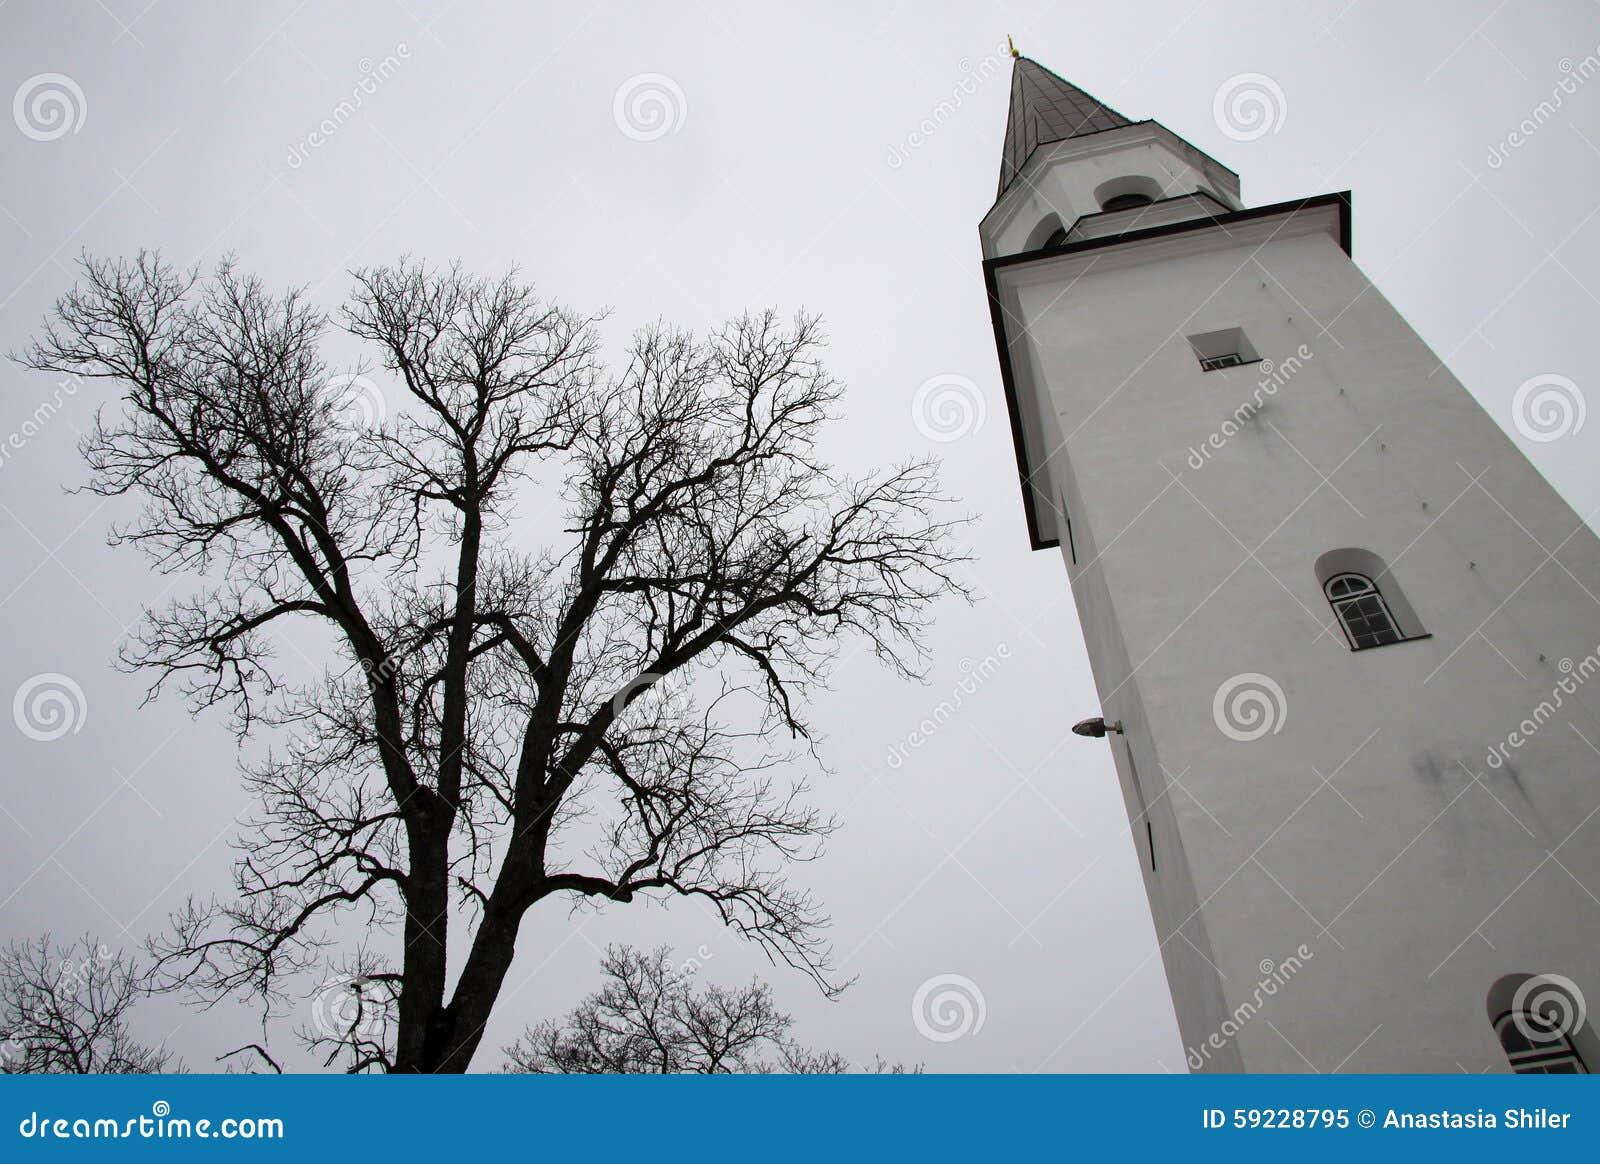 Download Campanario De La Iglesia Luterana Vieja De St Berthold En Sigulda, Letonia Imagen de archivo - Imagen de iglesia, cultura: 59228795